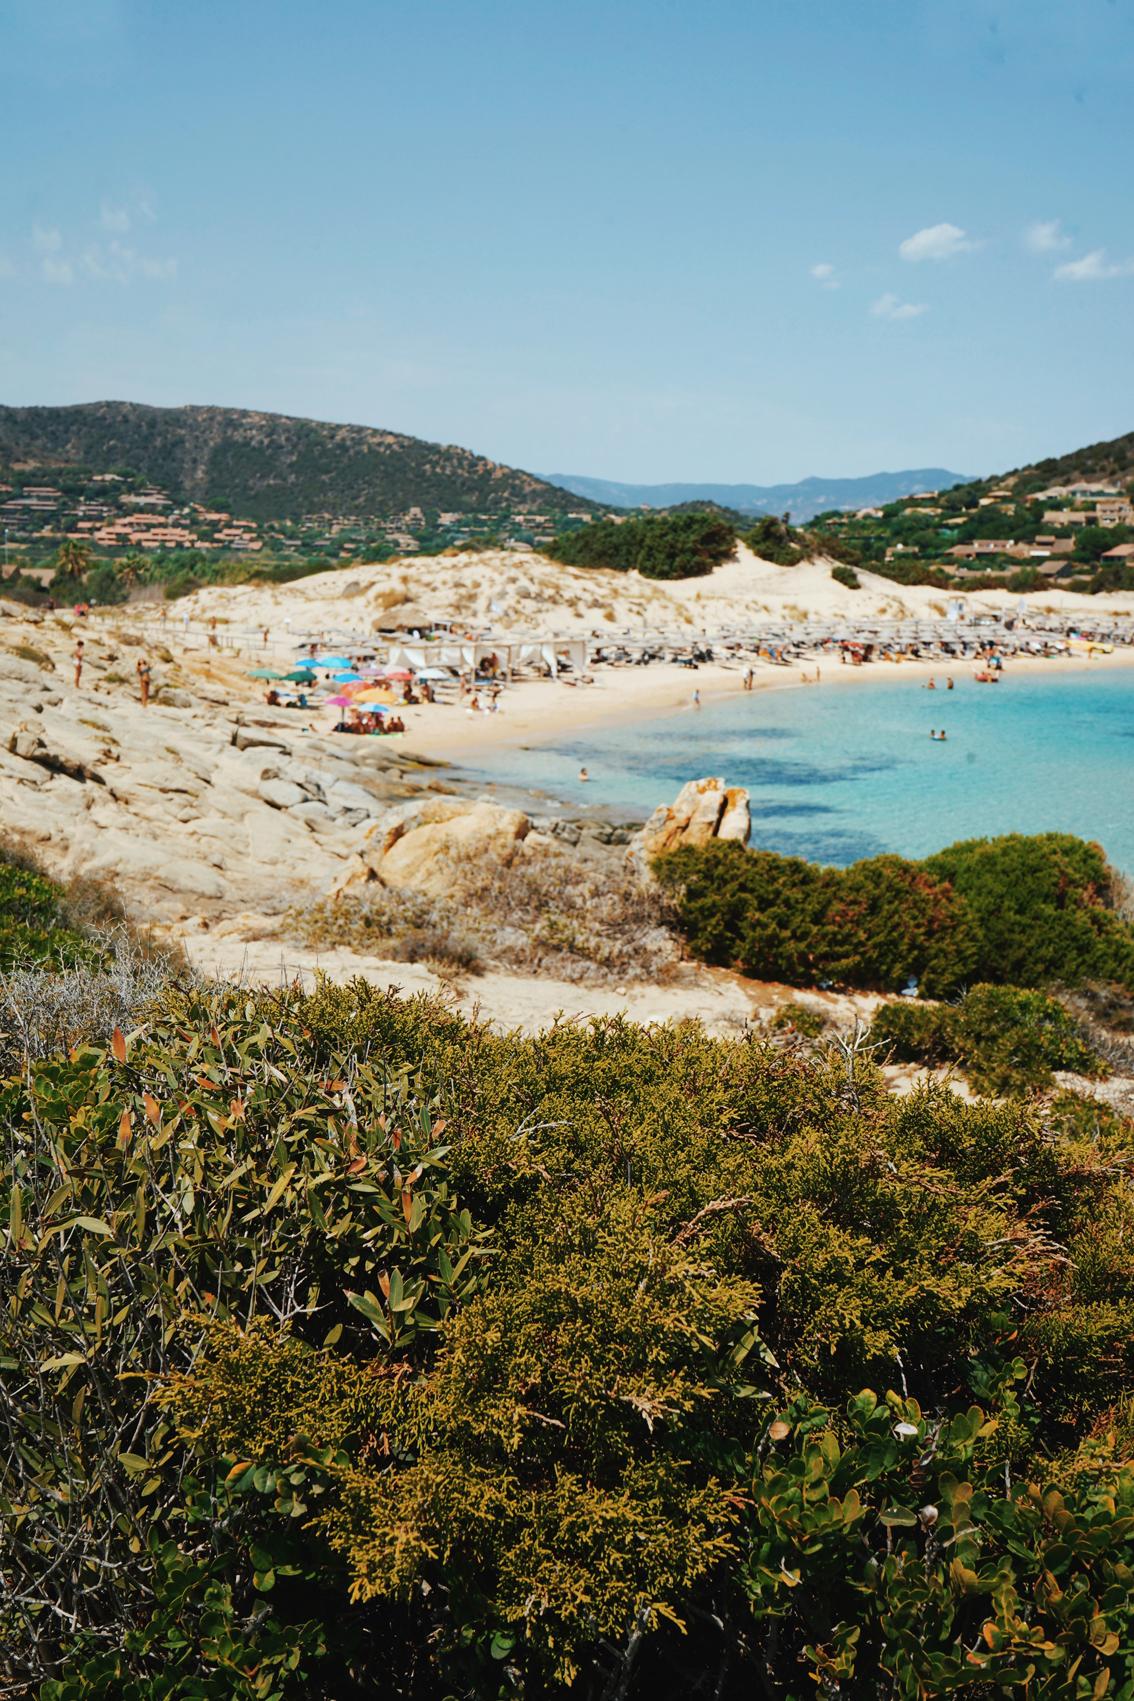 9 2 days in Cagliari ( Sardinia ), where to sleep to discover the best beaches.